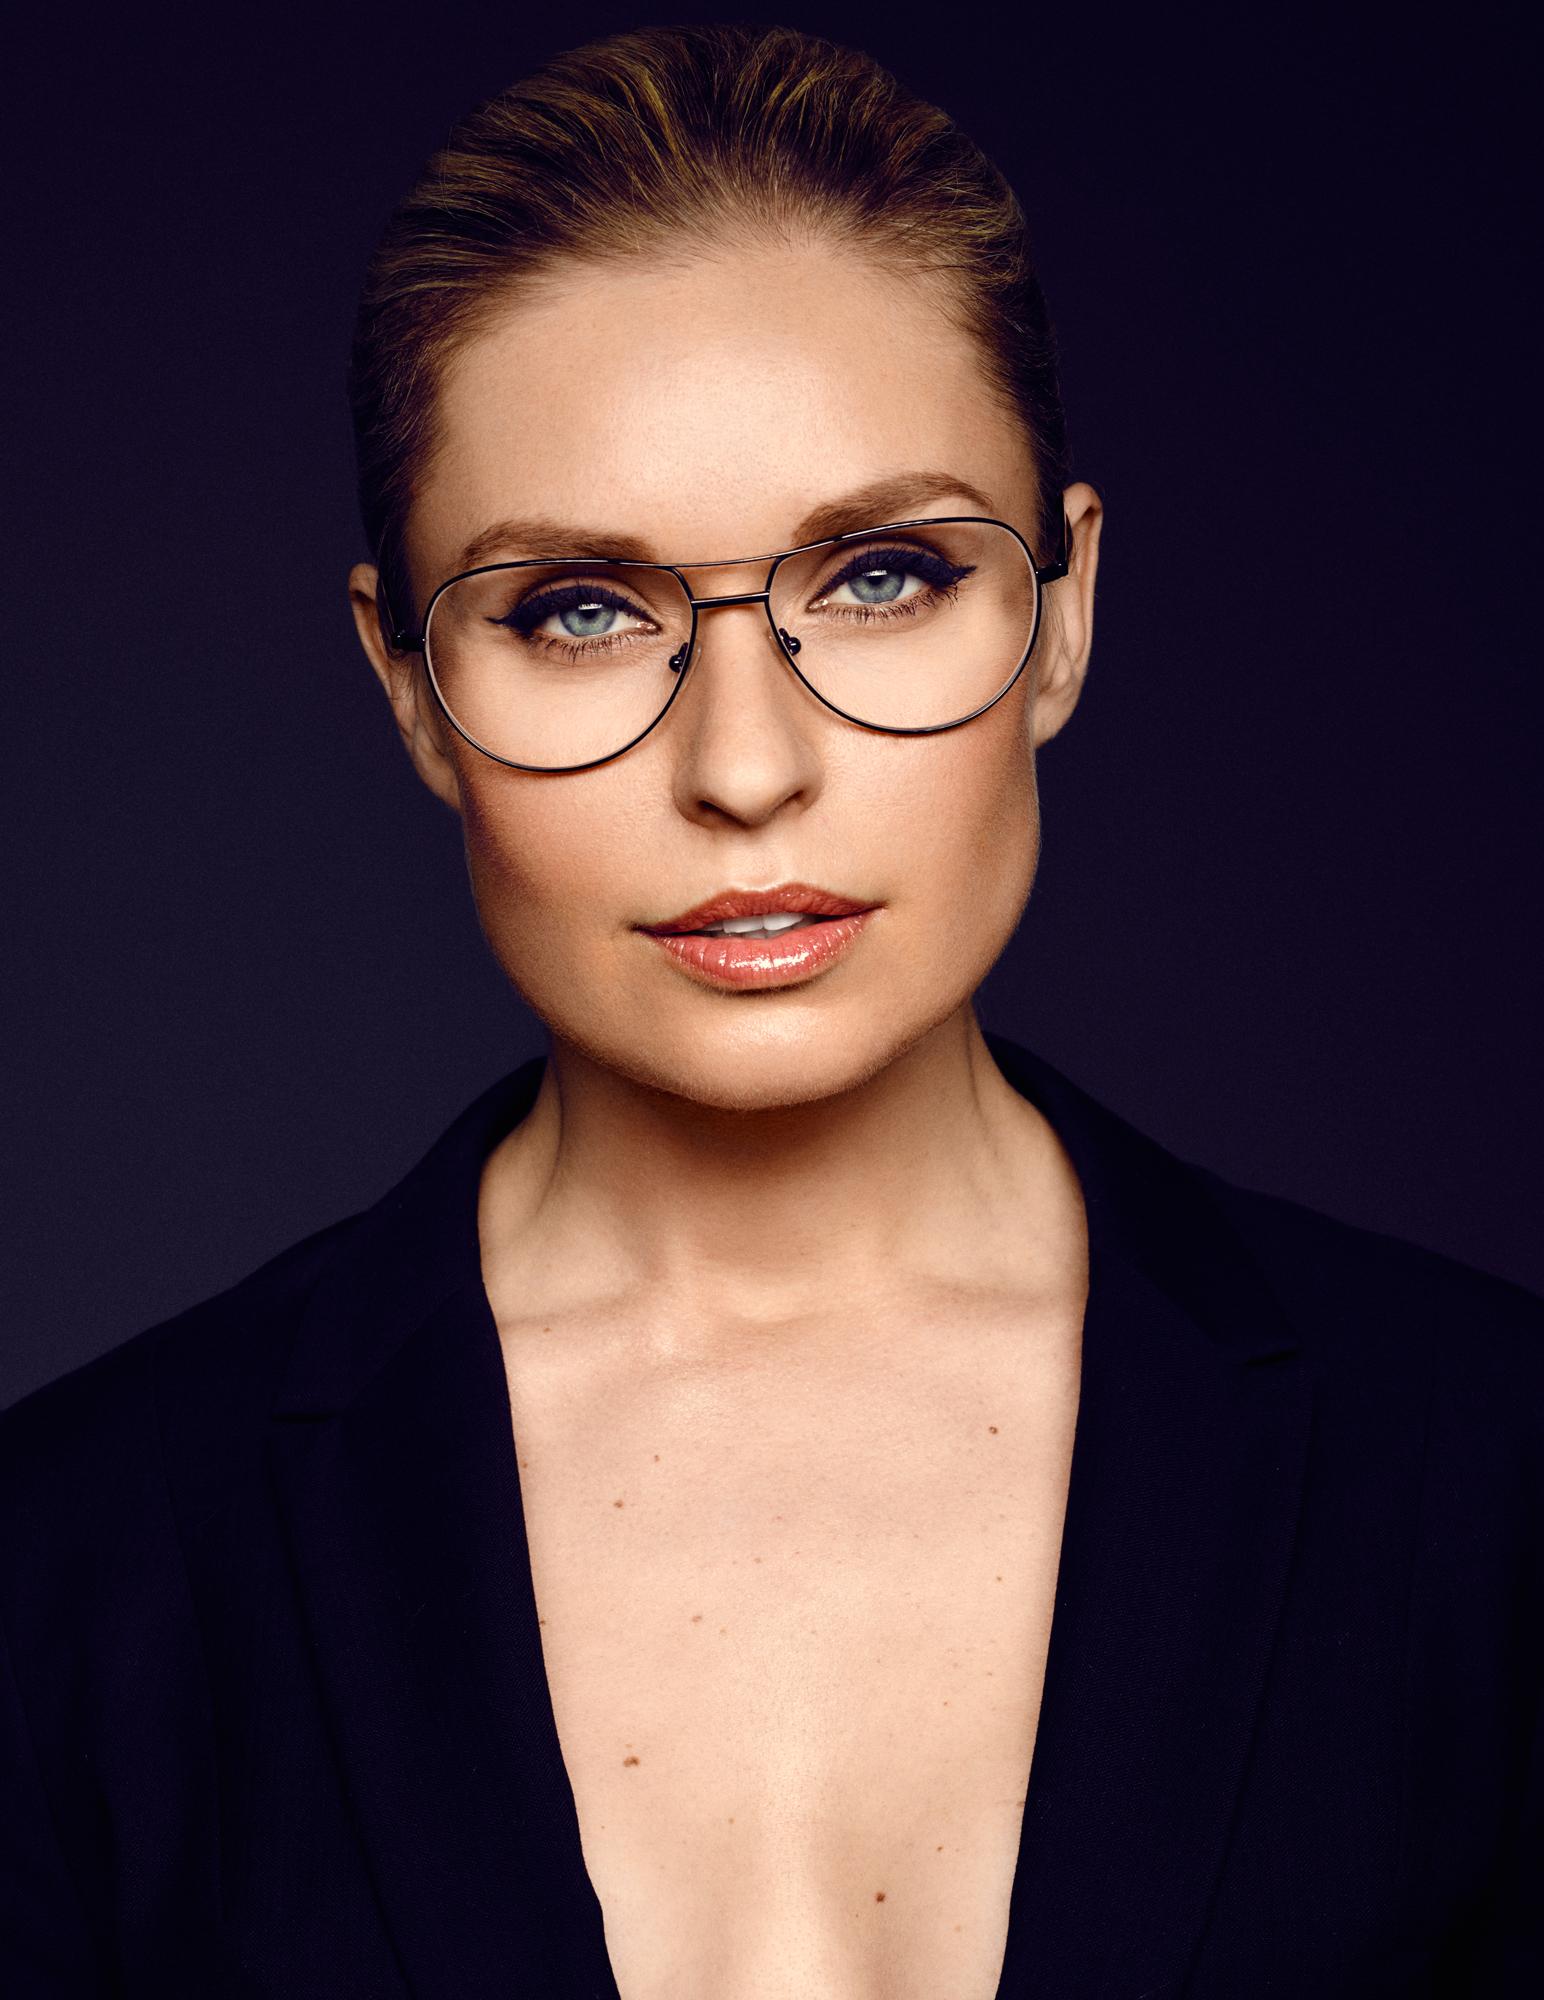 Astrid Søjberg fotograf christian grüner briller louis nielsen